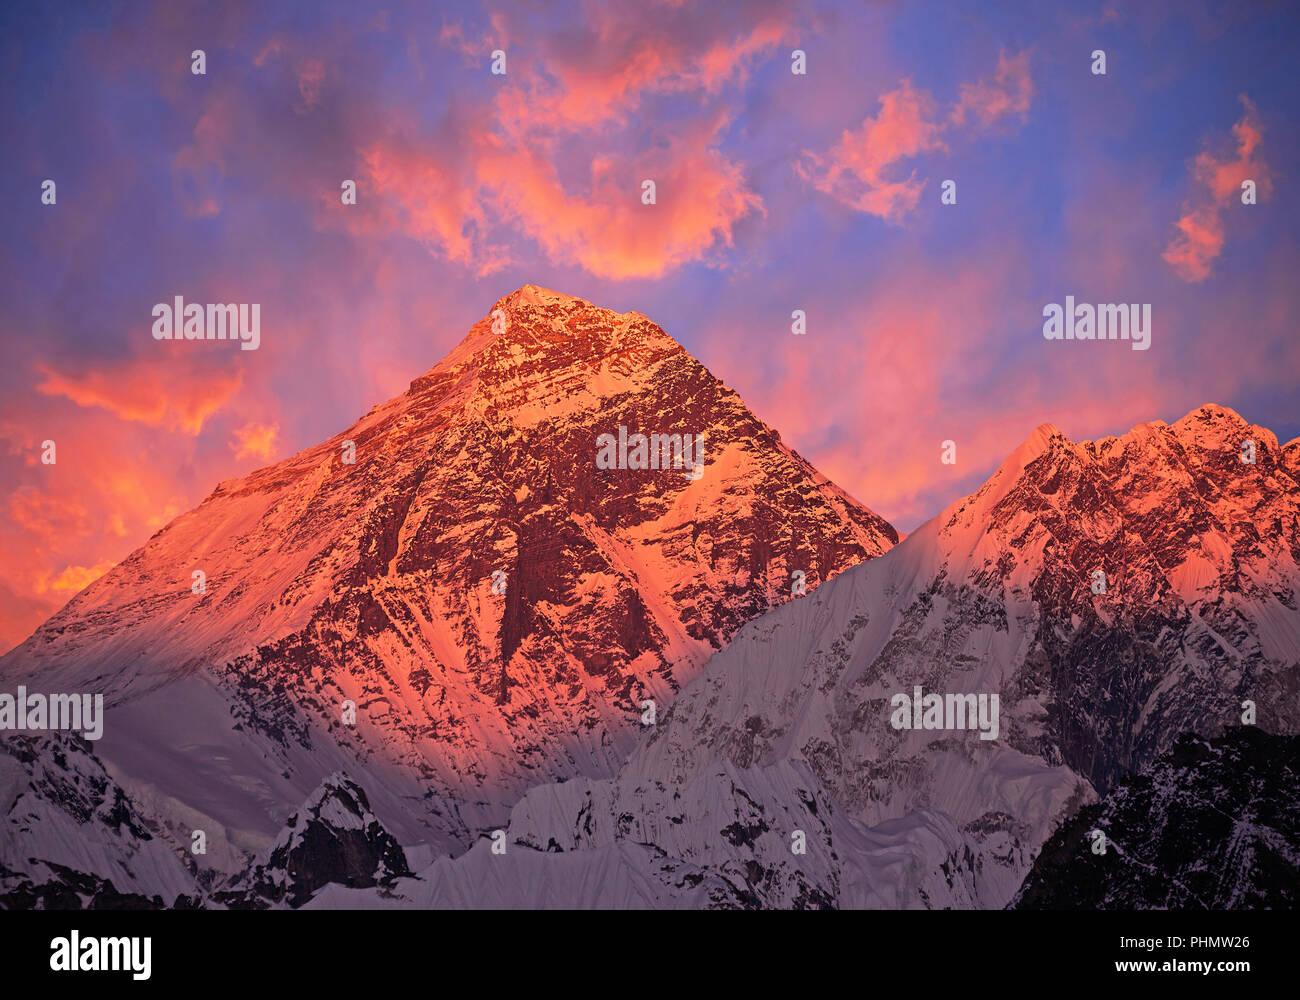 Mount Everest (8848 m) at sunset. - Stock Image